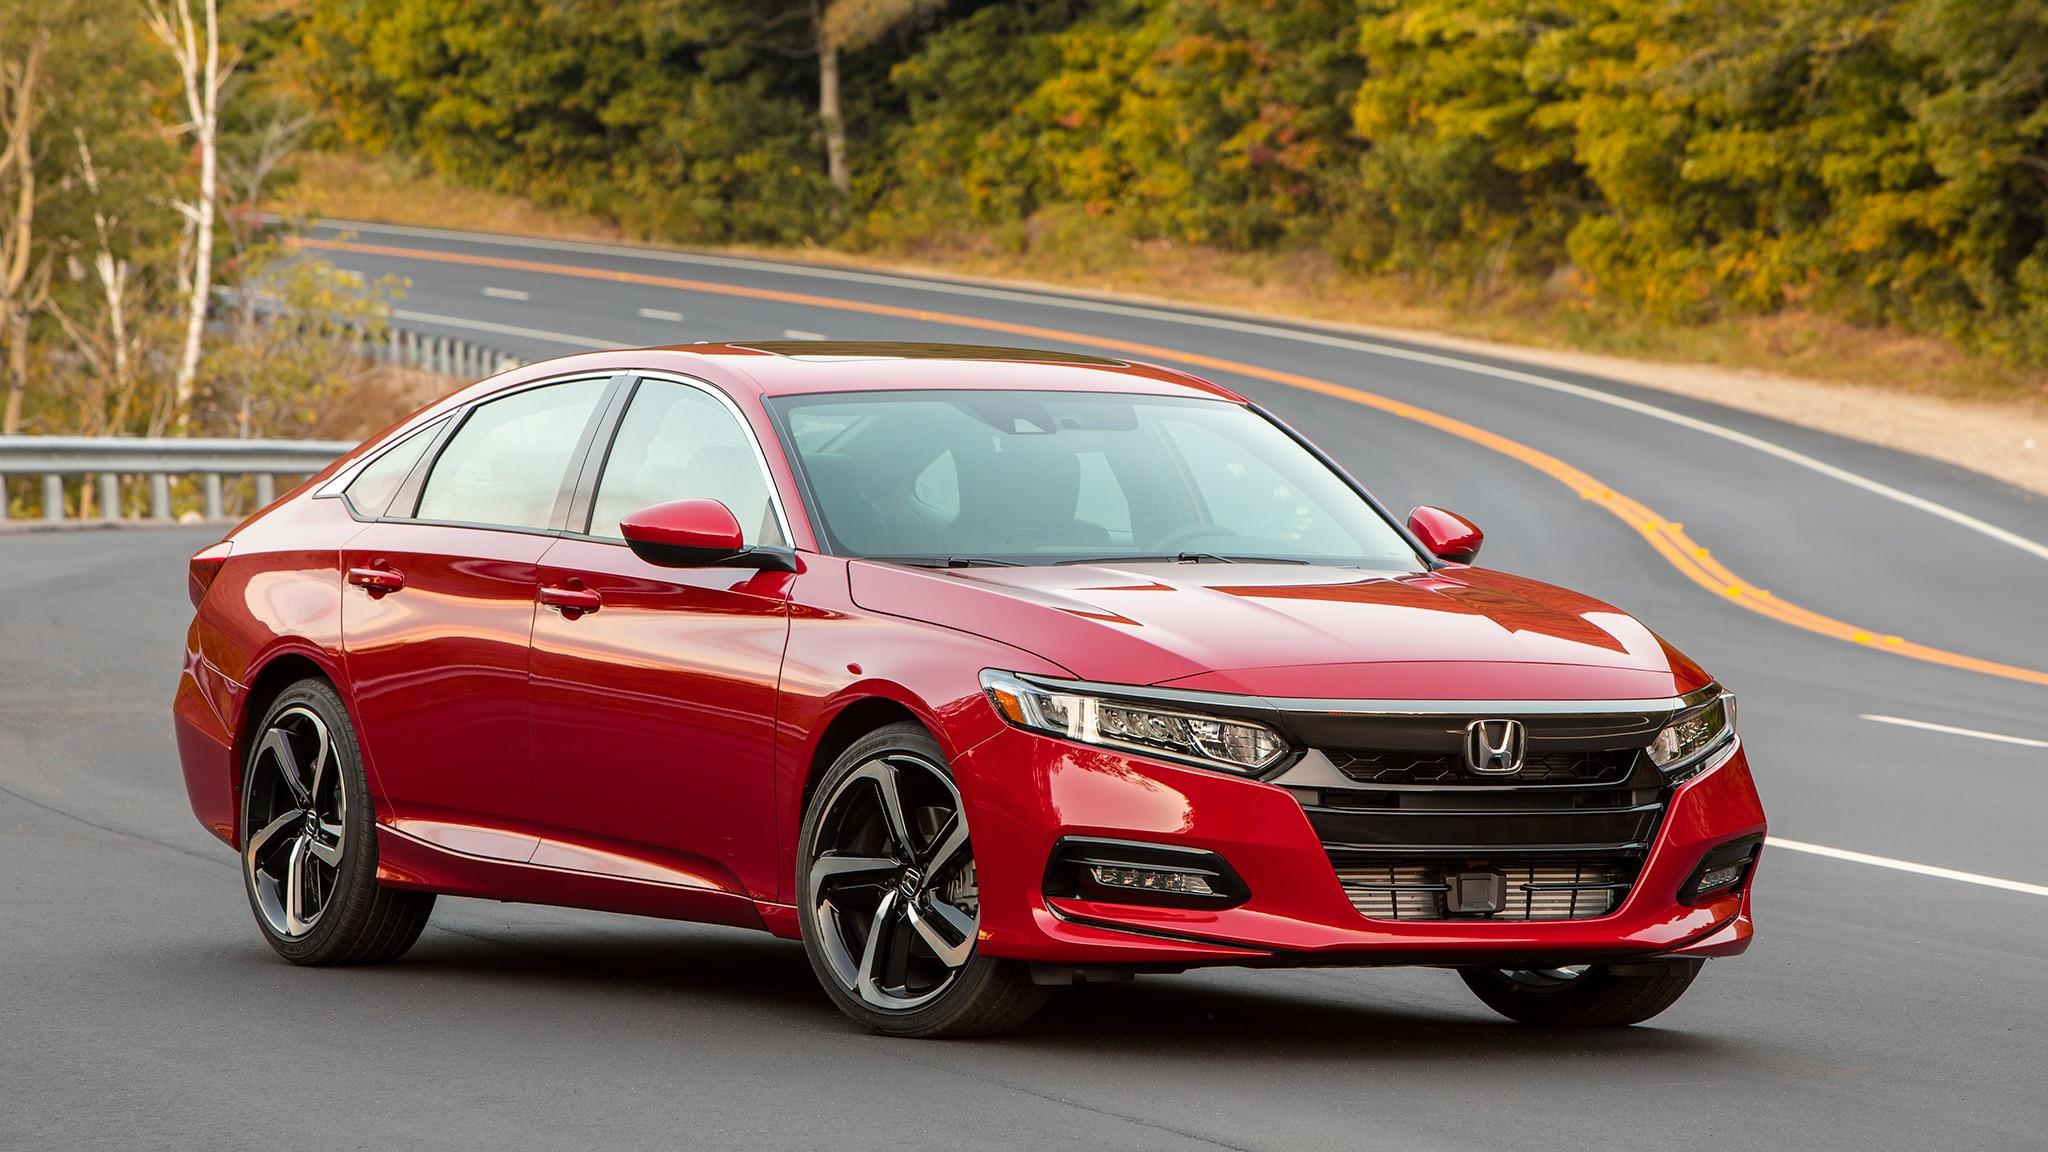 Honda Accord S Manual Transmission Is 2020 S Latest Victim